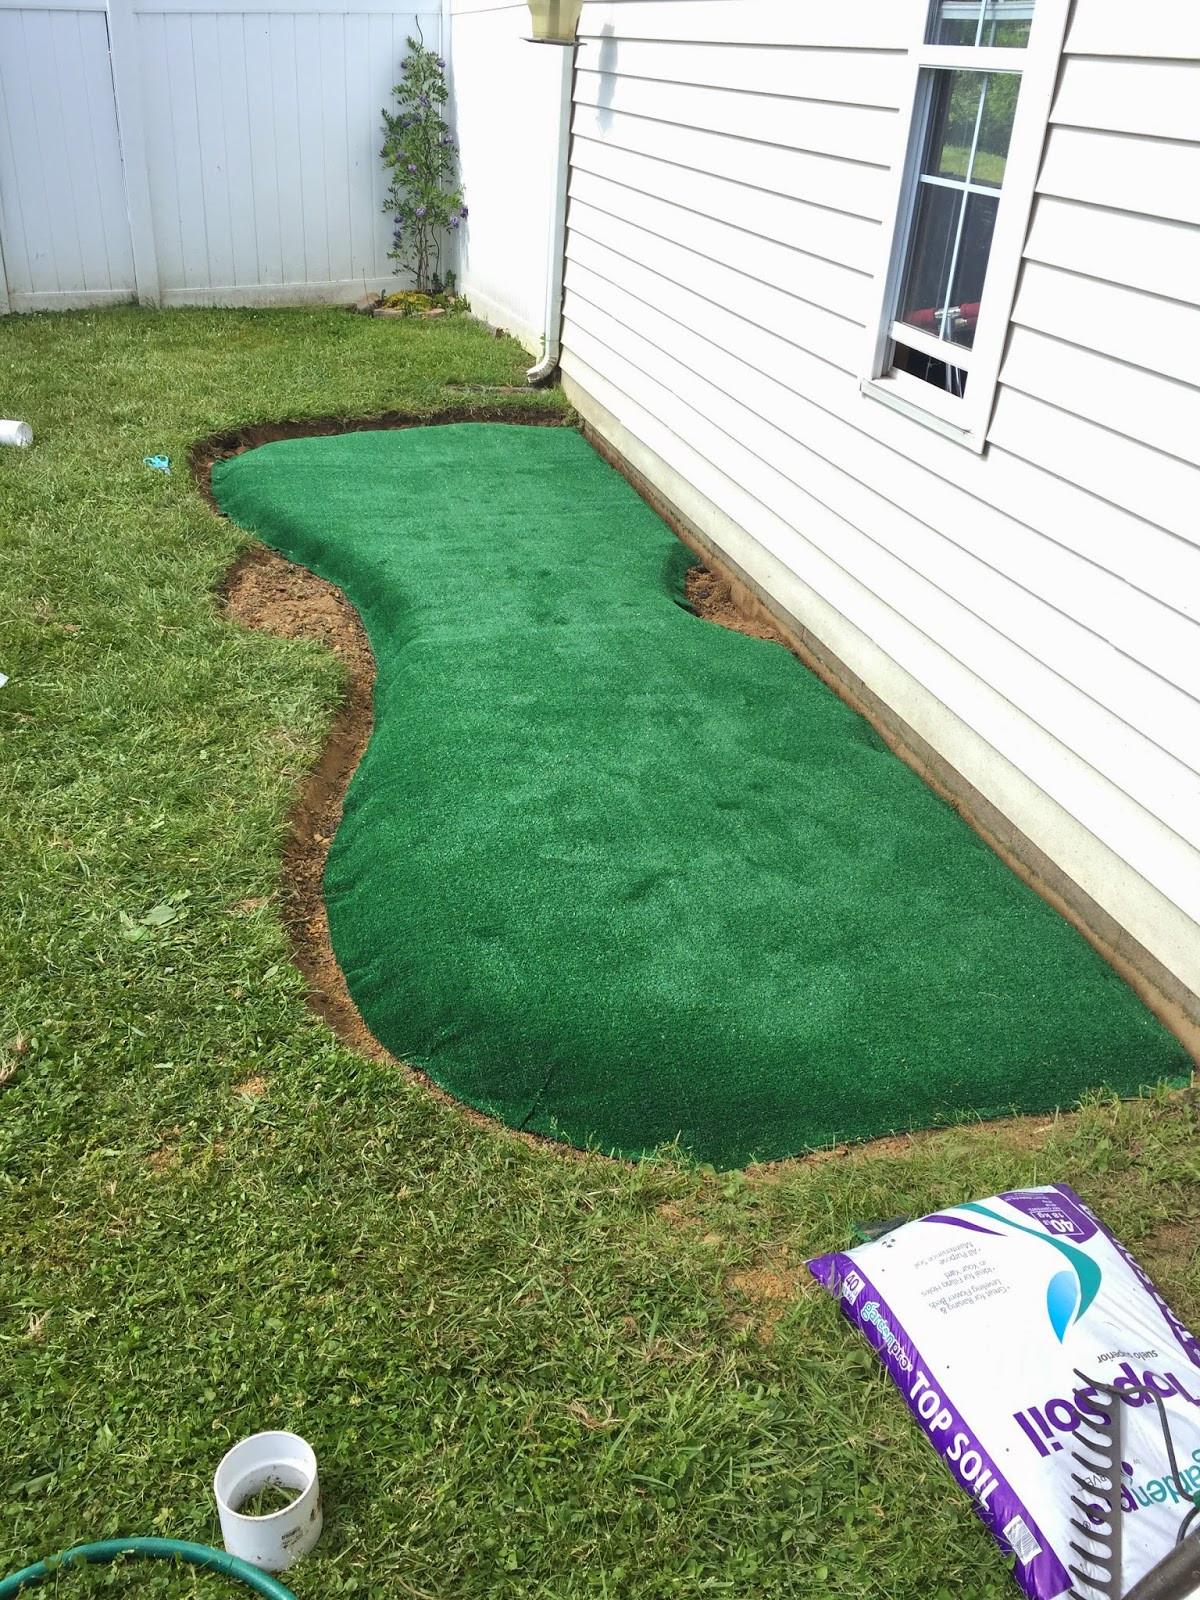 Backyard Putting Green DIY  Little Bit Funky How to make a backyard putting green